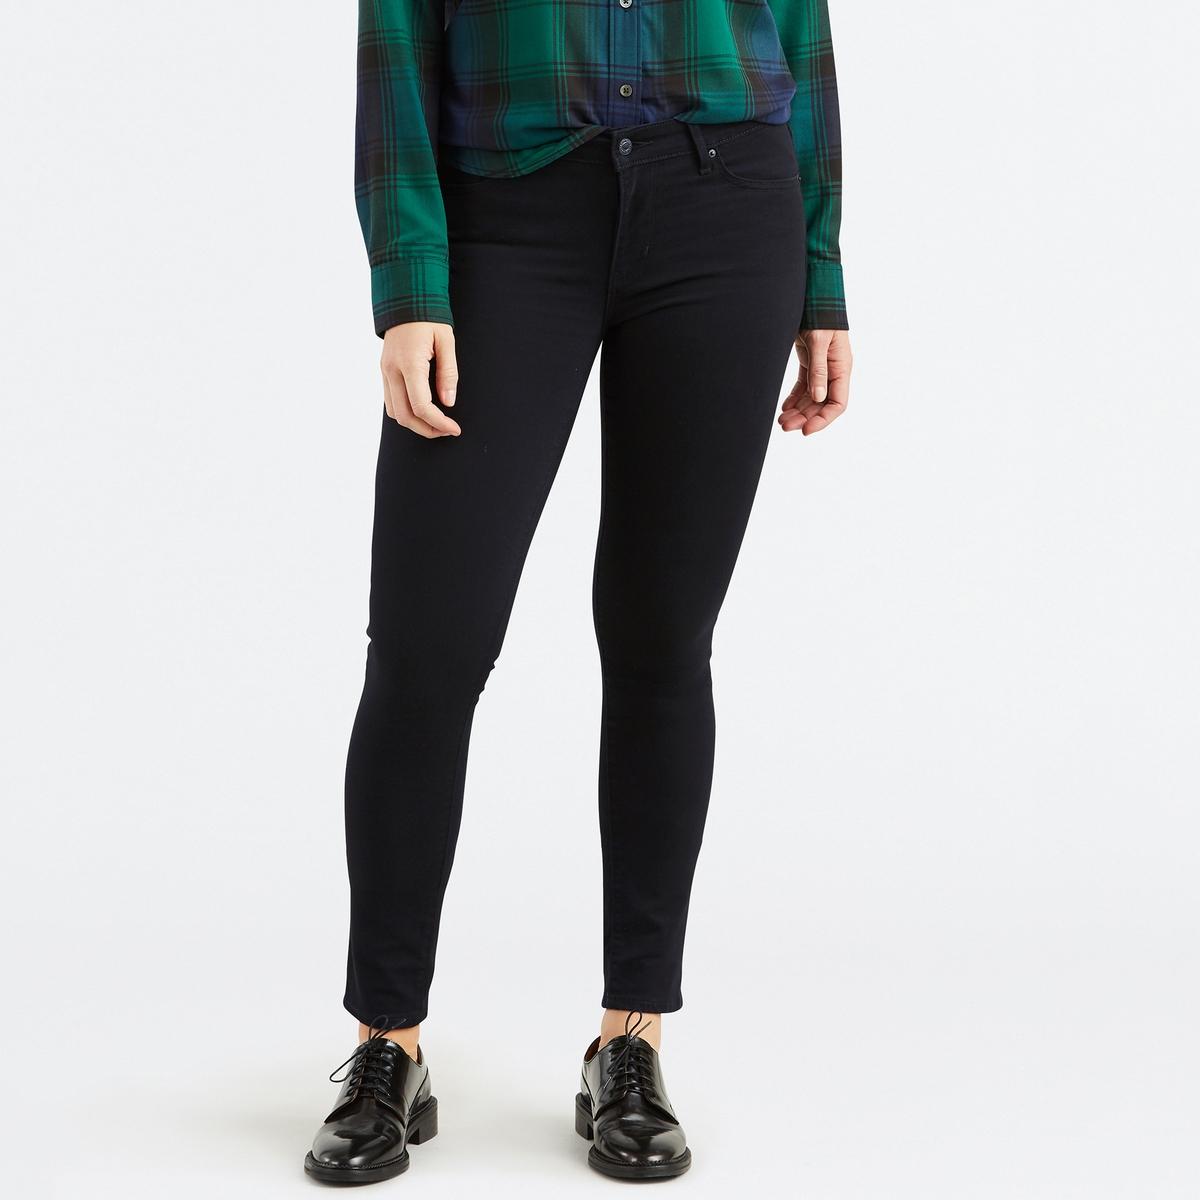 LEVI'S - Levis Jeans 711 SKINNY